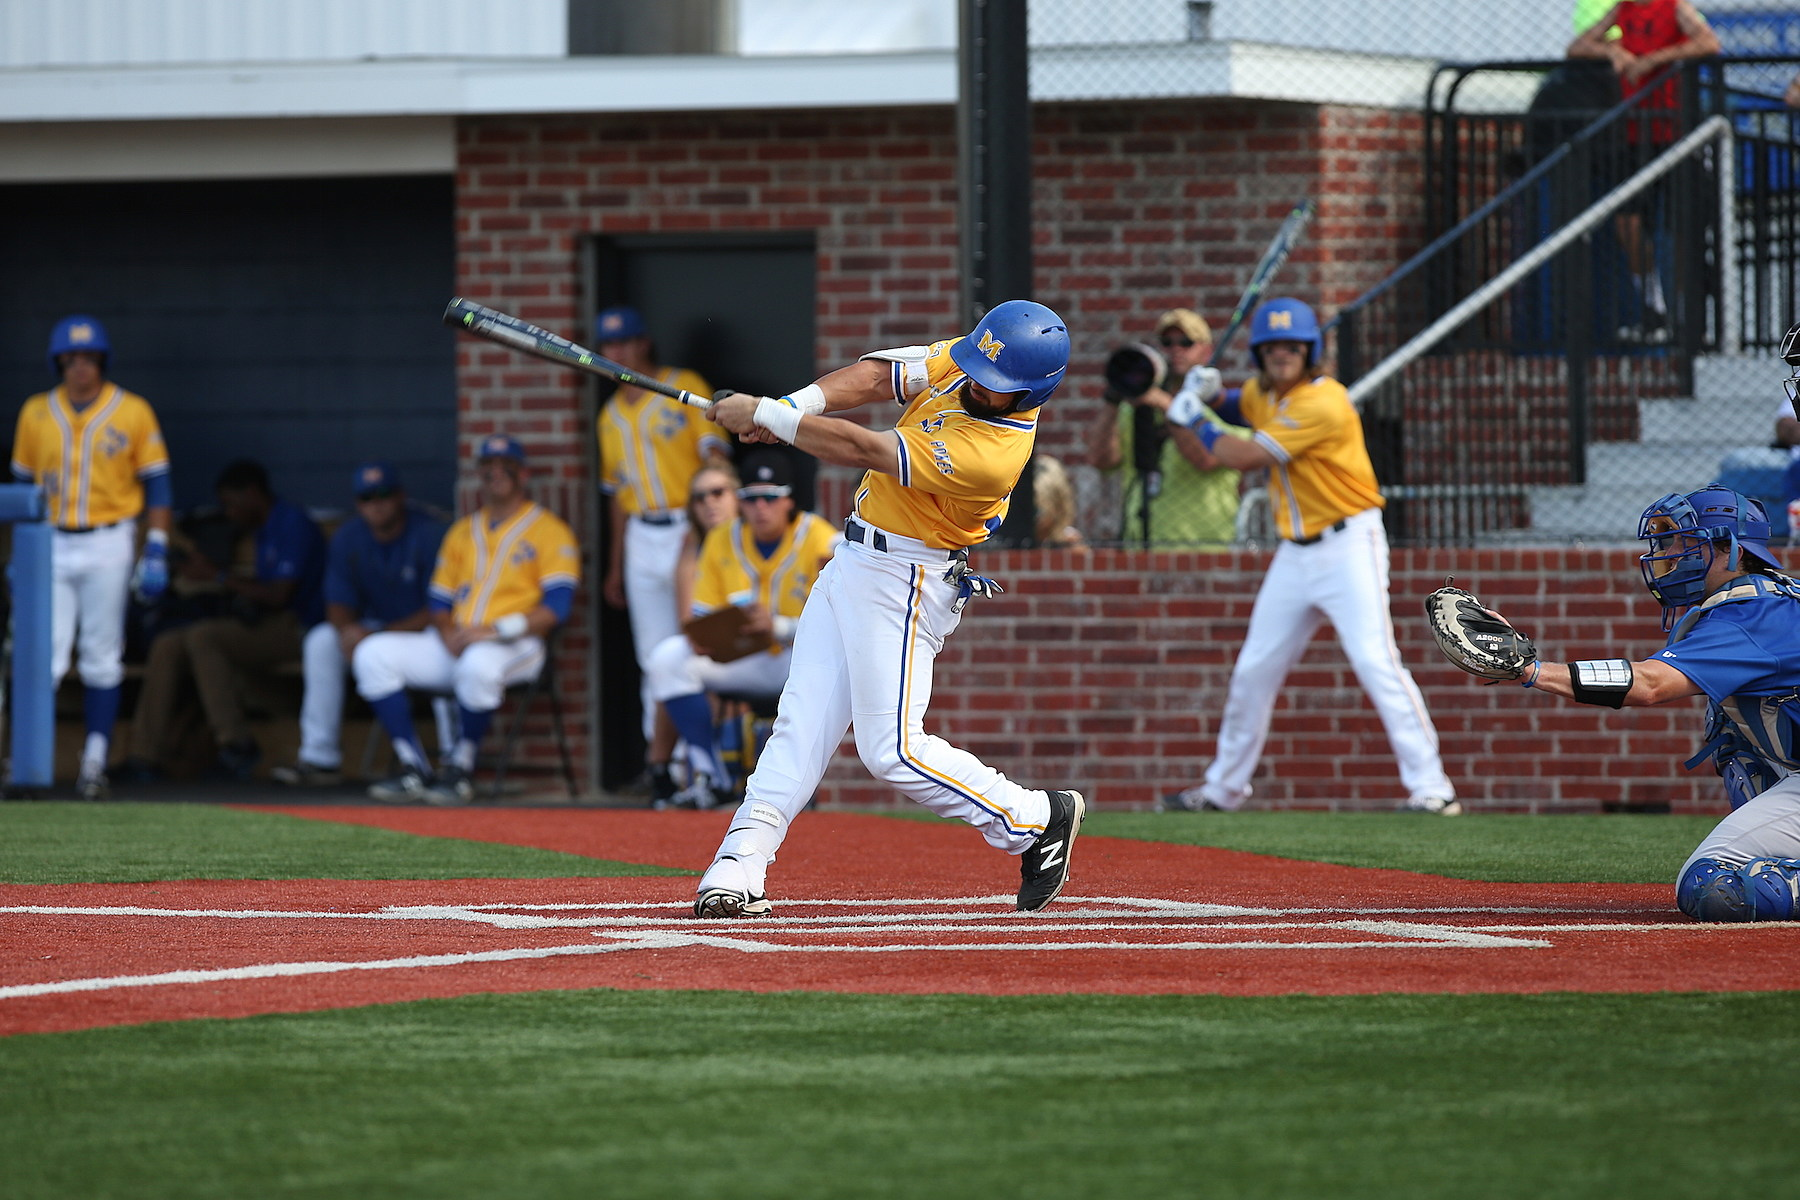 McNeese Baseball (Photo provided by Matt Bonnette MSU)